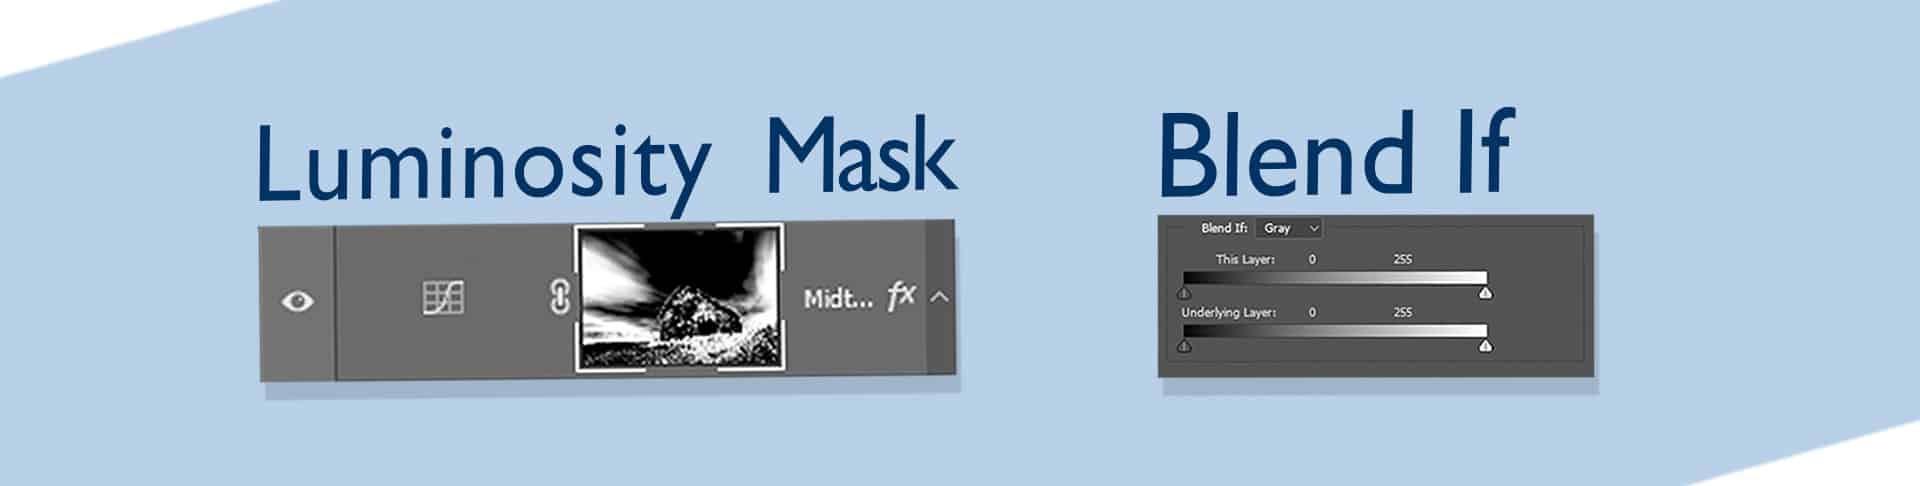 Luminosity Masks Blend If 1